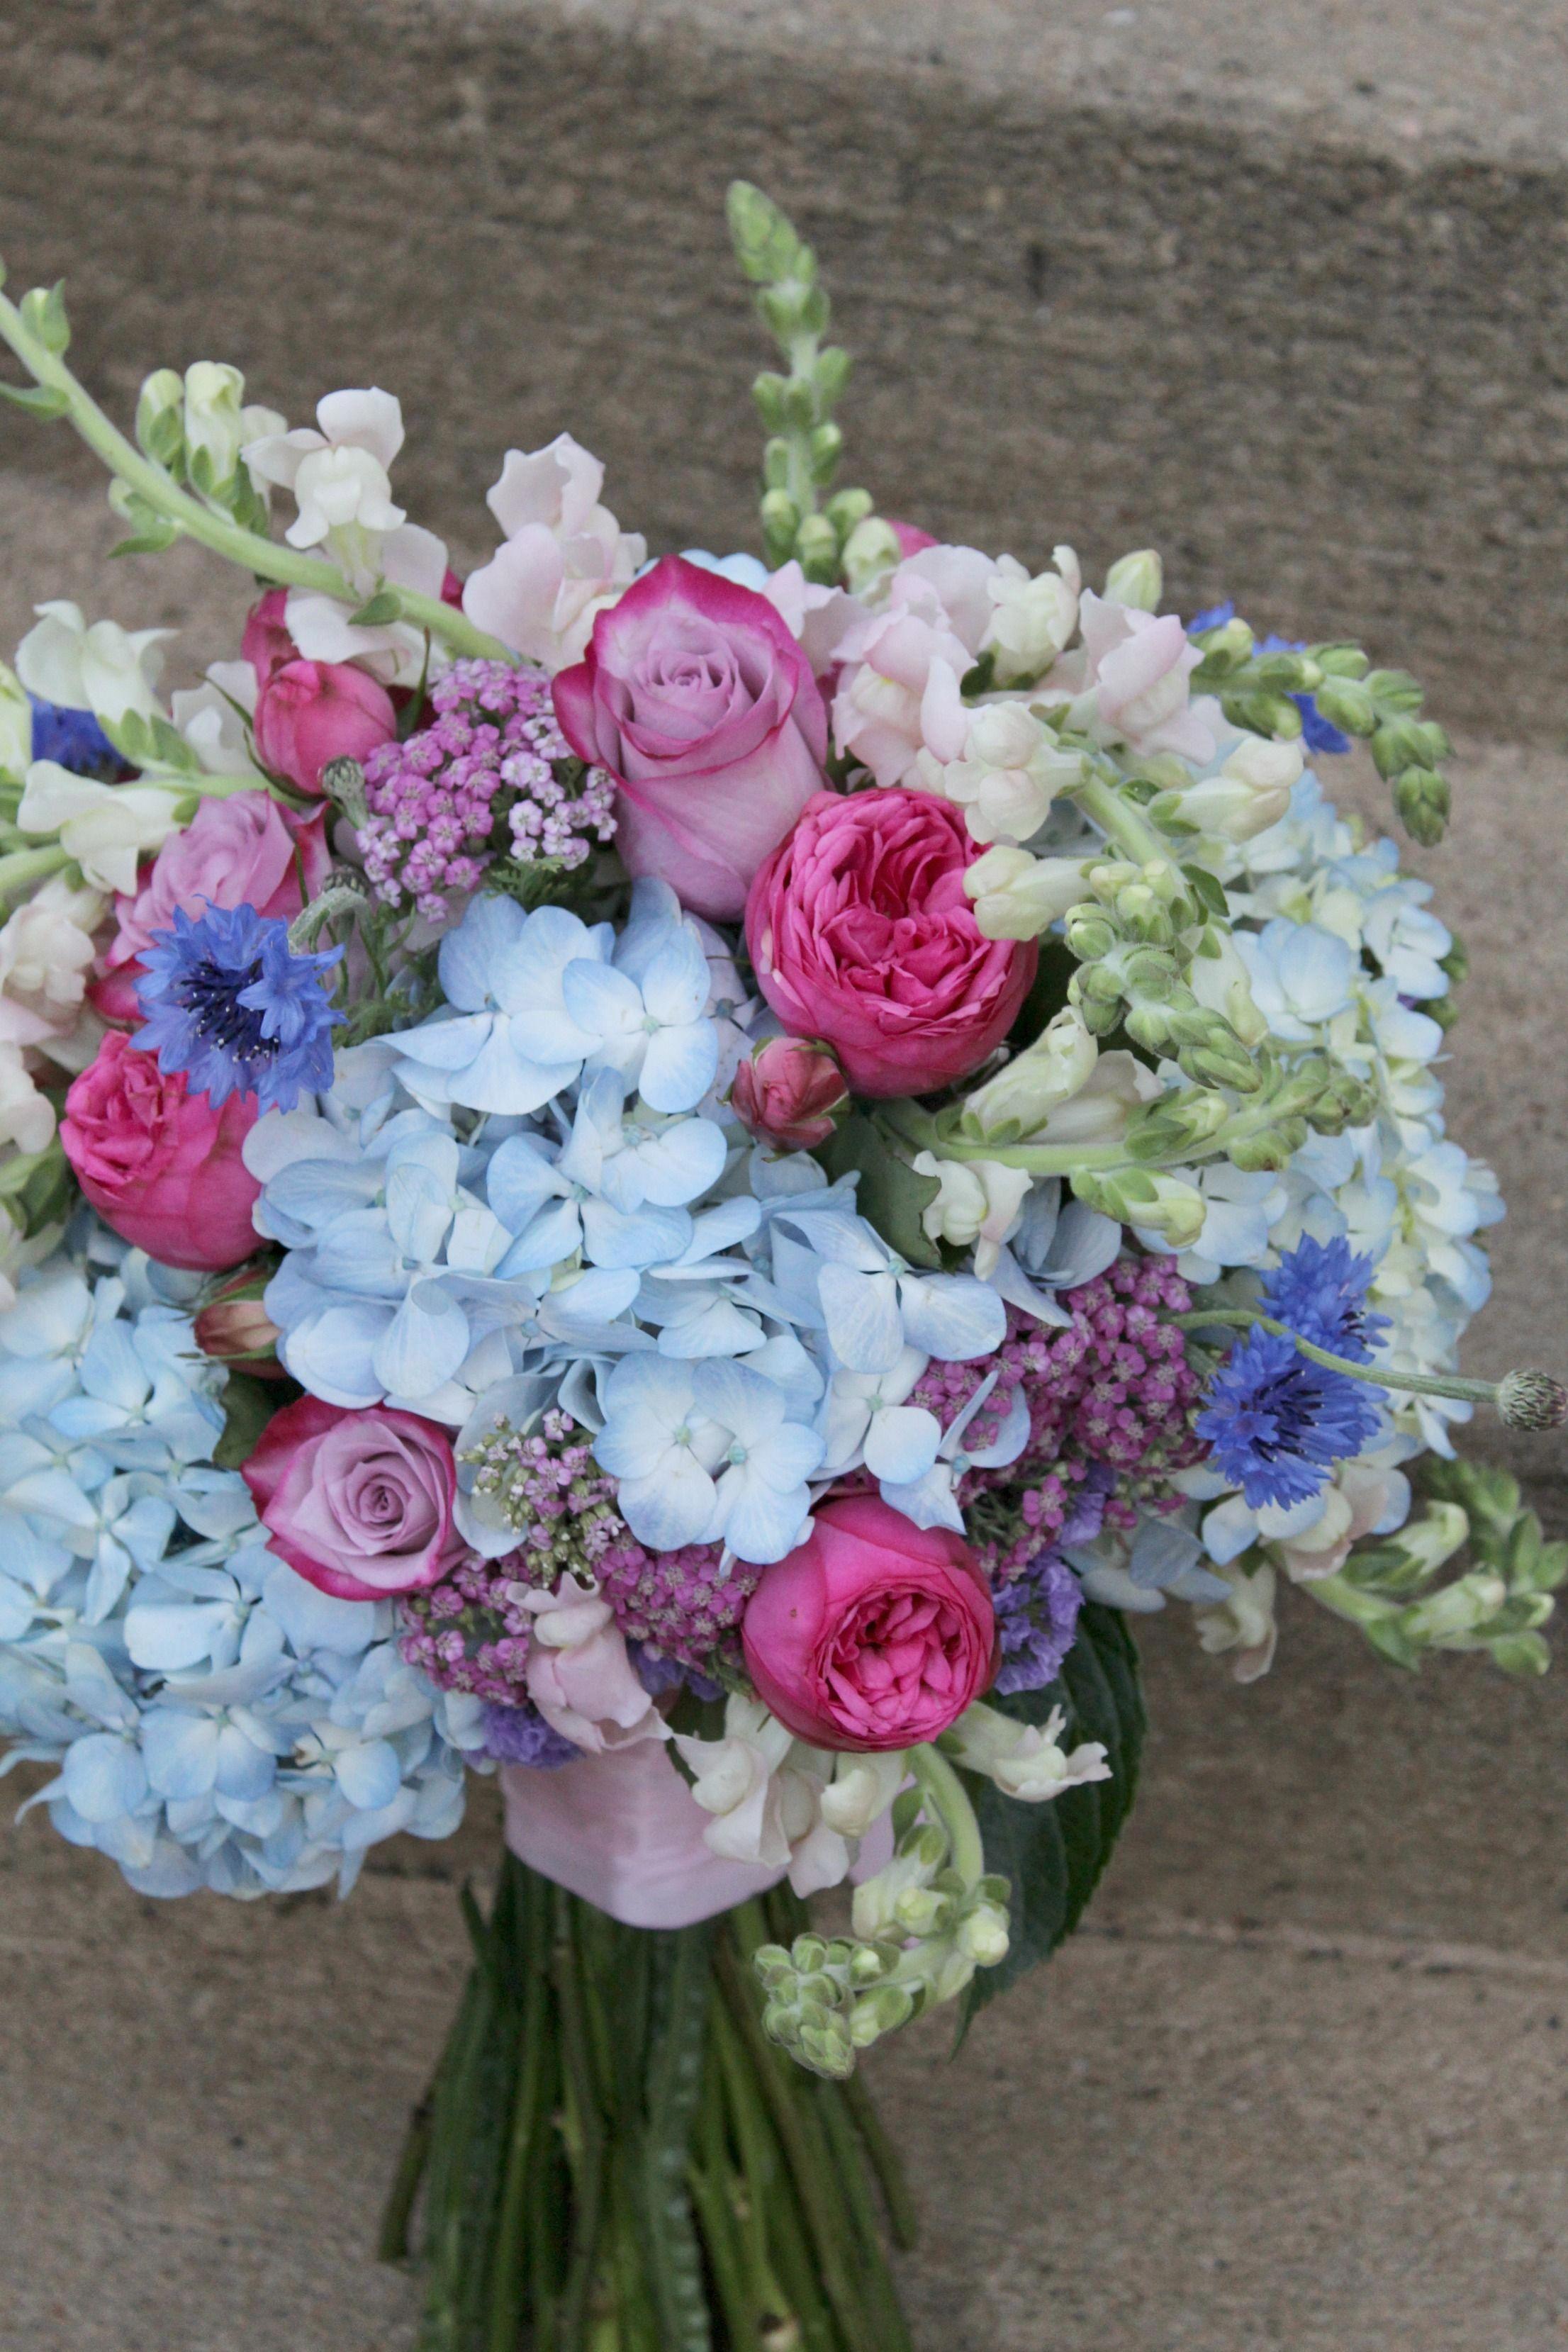 Bridal Bouquet Made Up Fresh Blue Hydrangeas Light Pink Snap Dragons Blue Cornflowers Prom Flowers Bouquet Hydrangea Bridal Bouquet Blue Flower Arrangements